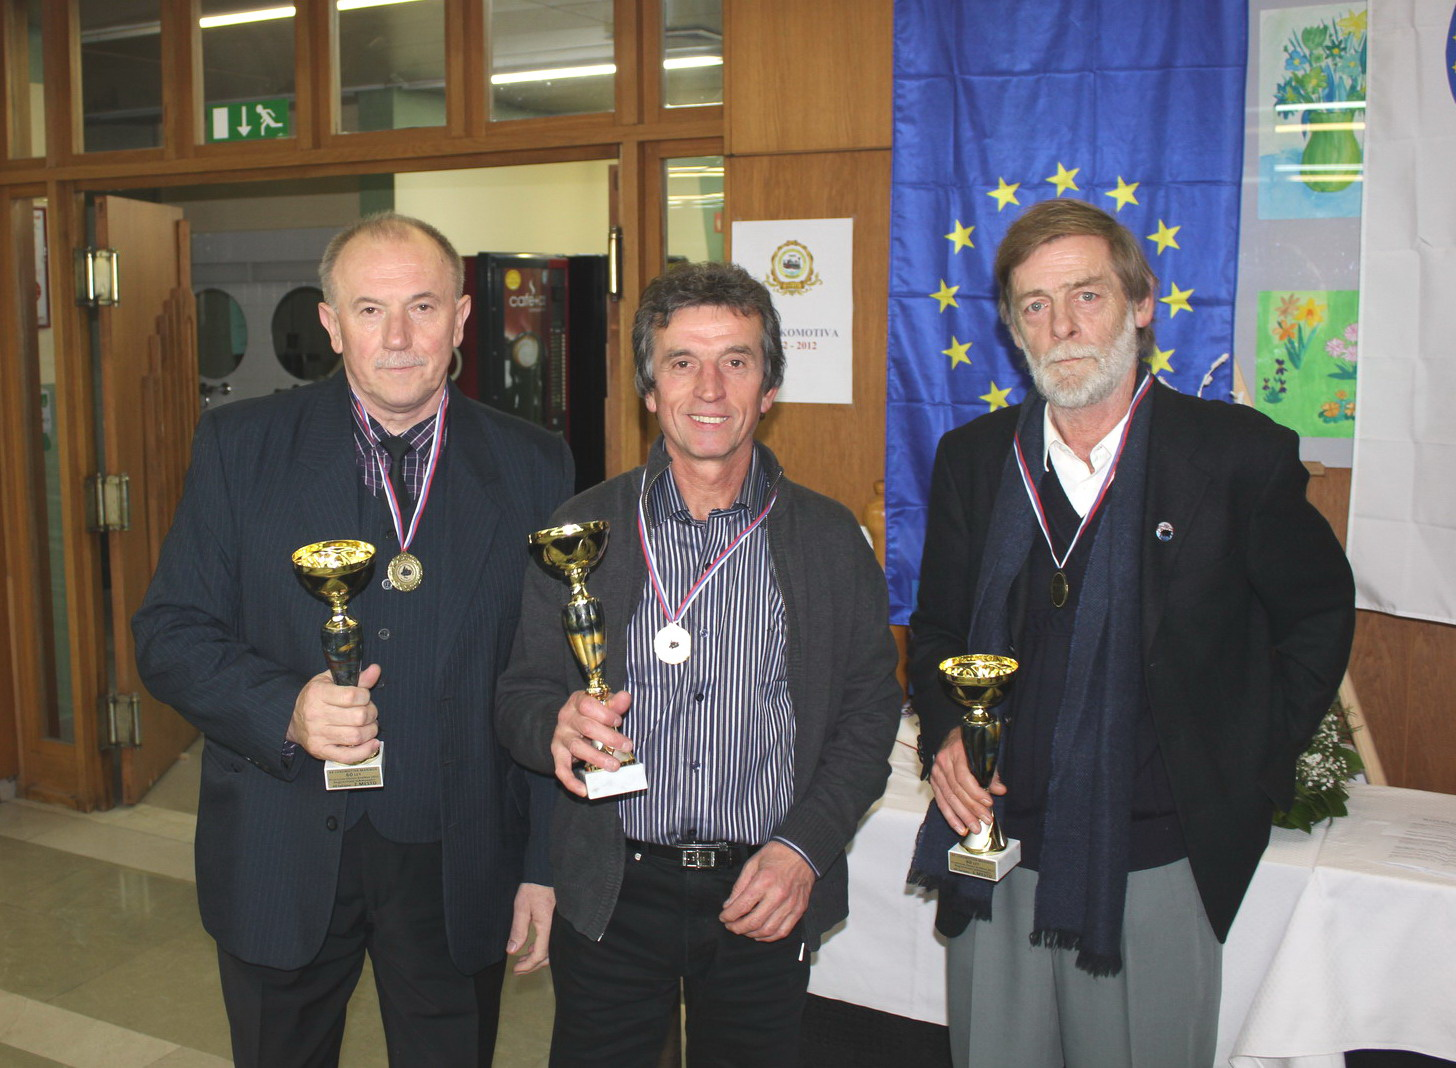 Franc Ilešič, Franc Kirbiš in Borut Planinšič, 2012